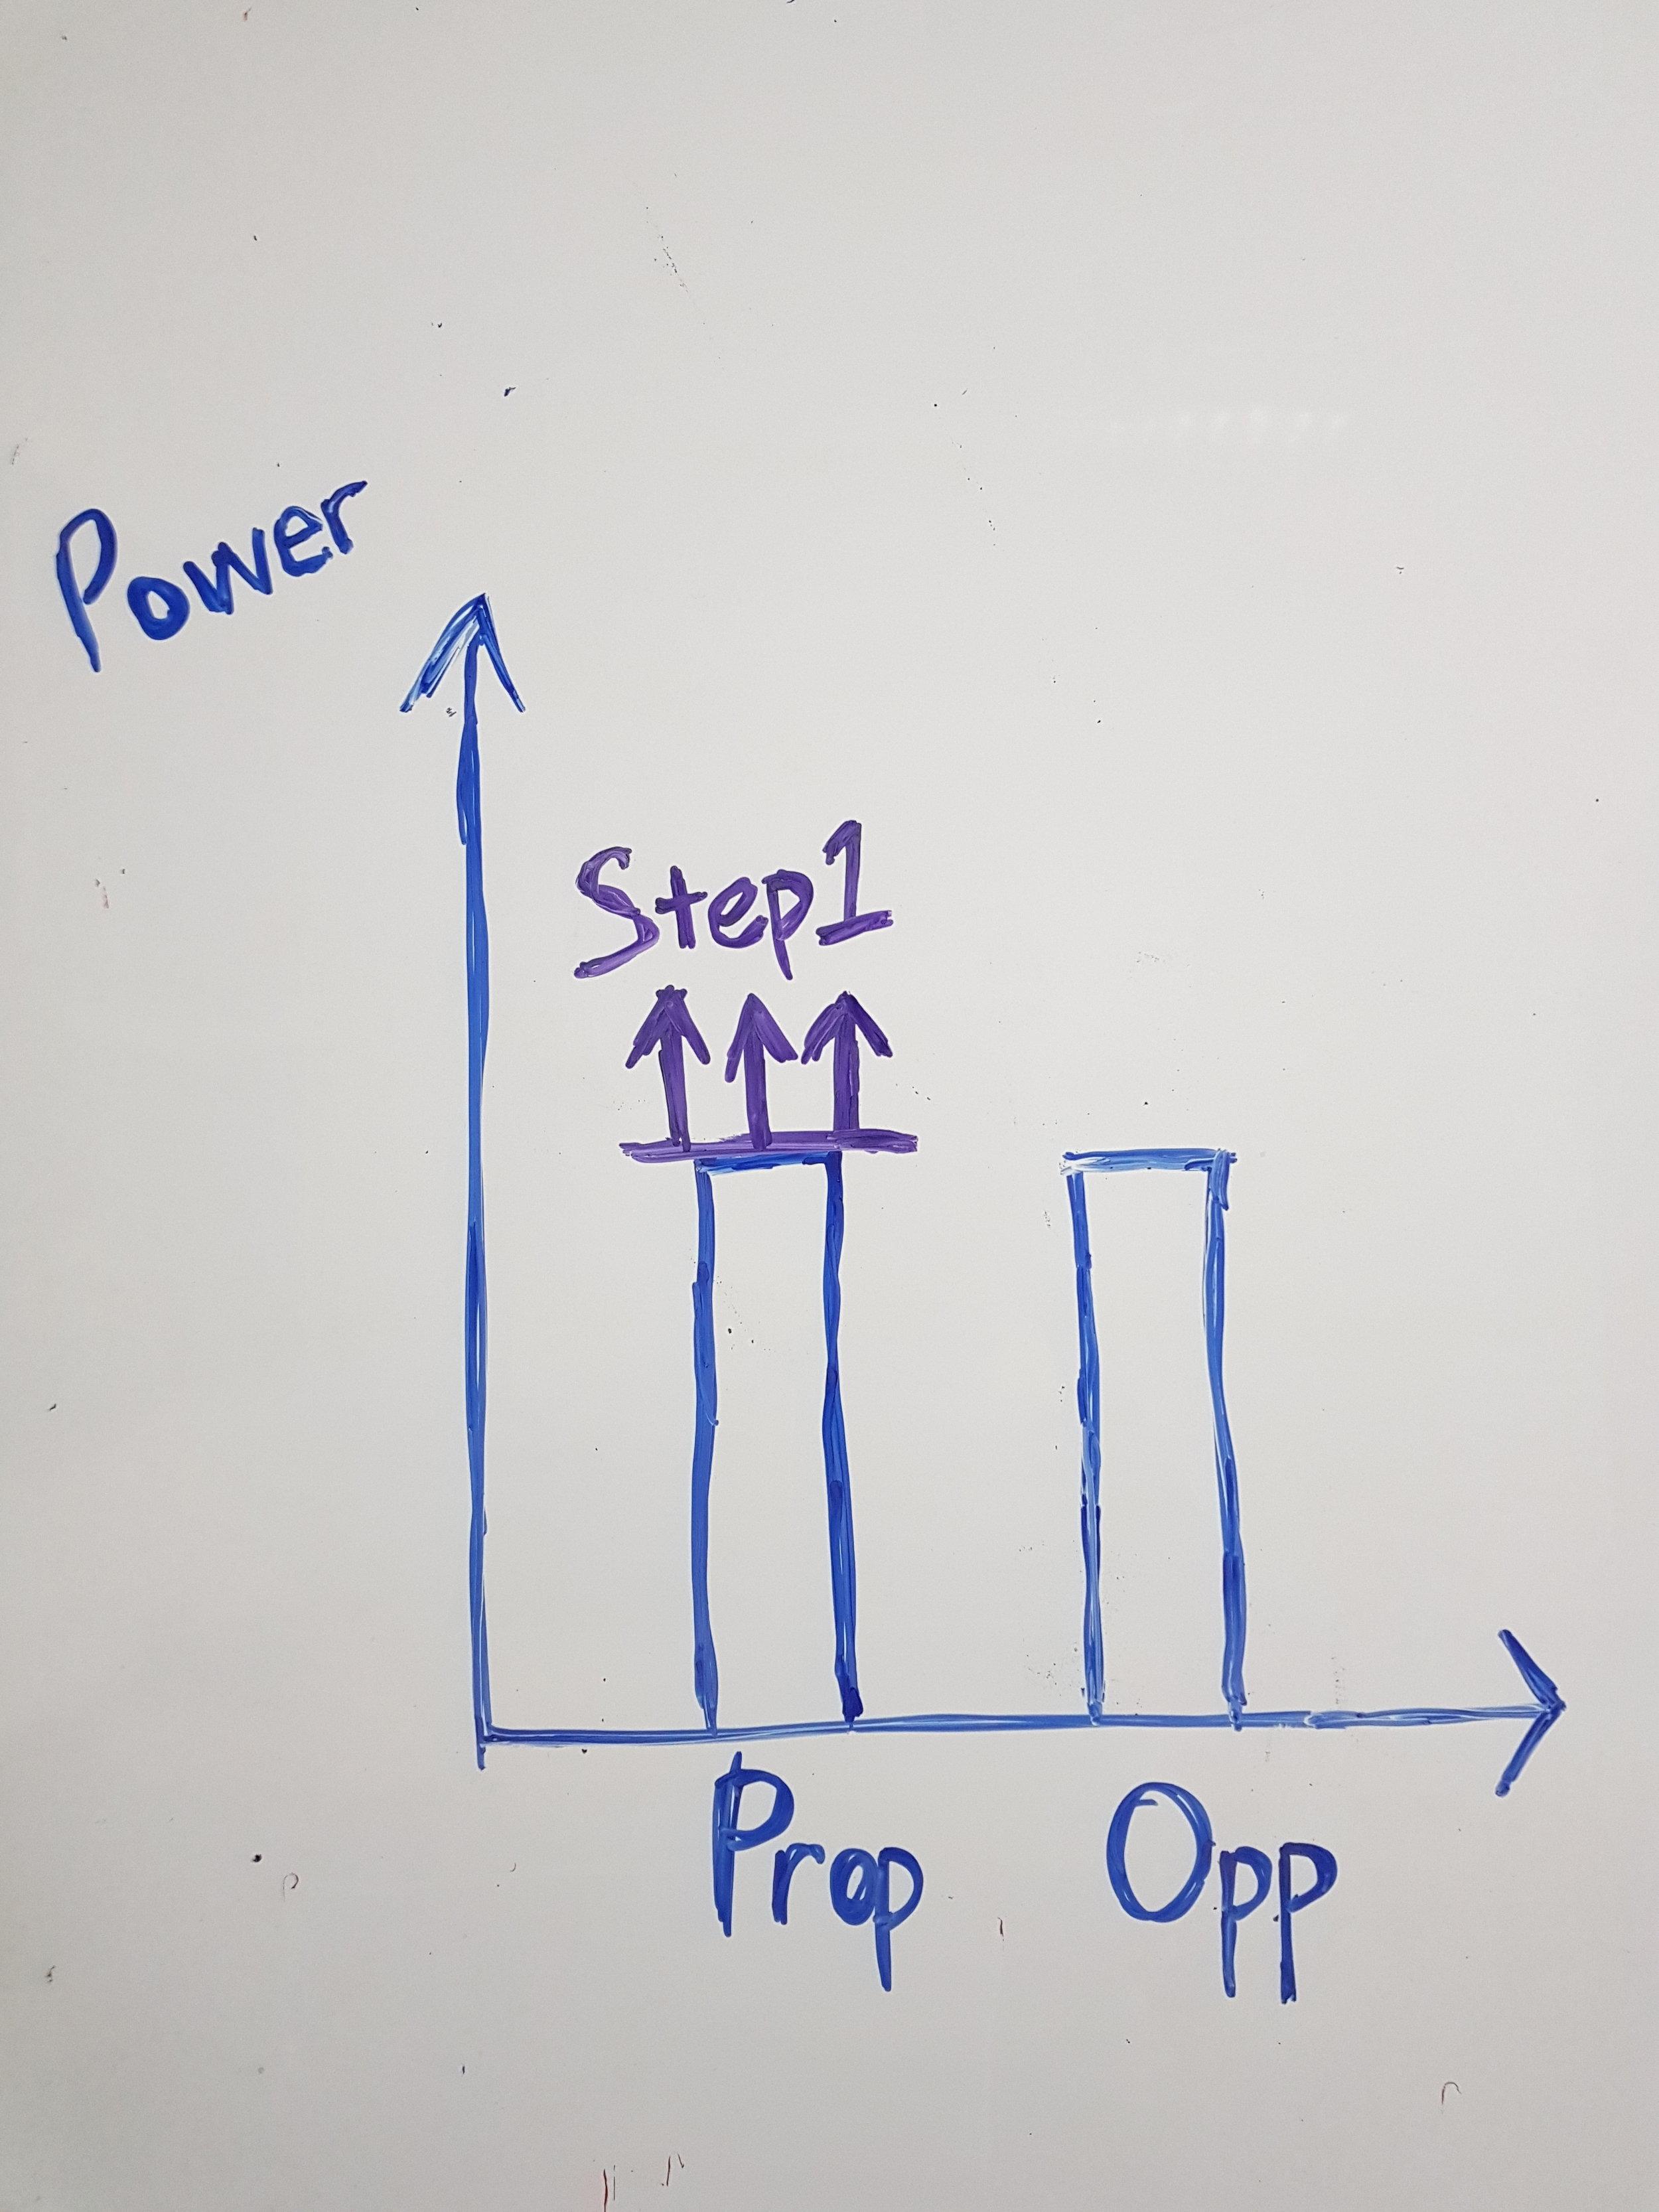 POWER OVERWHELMING!